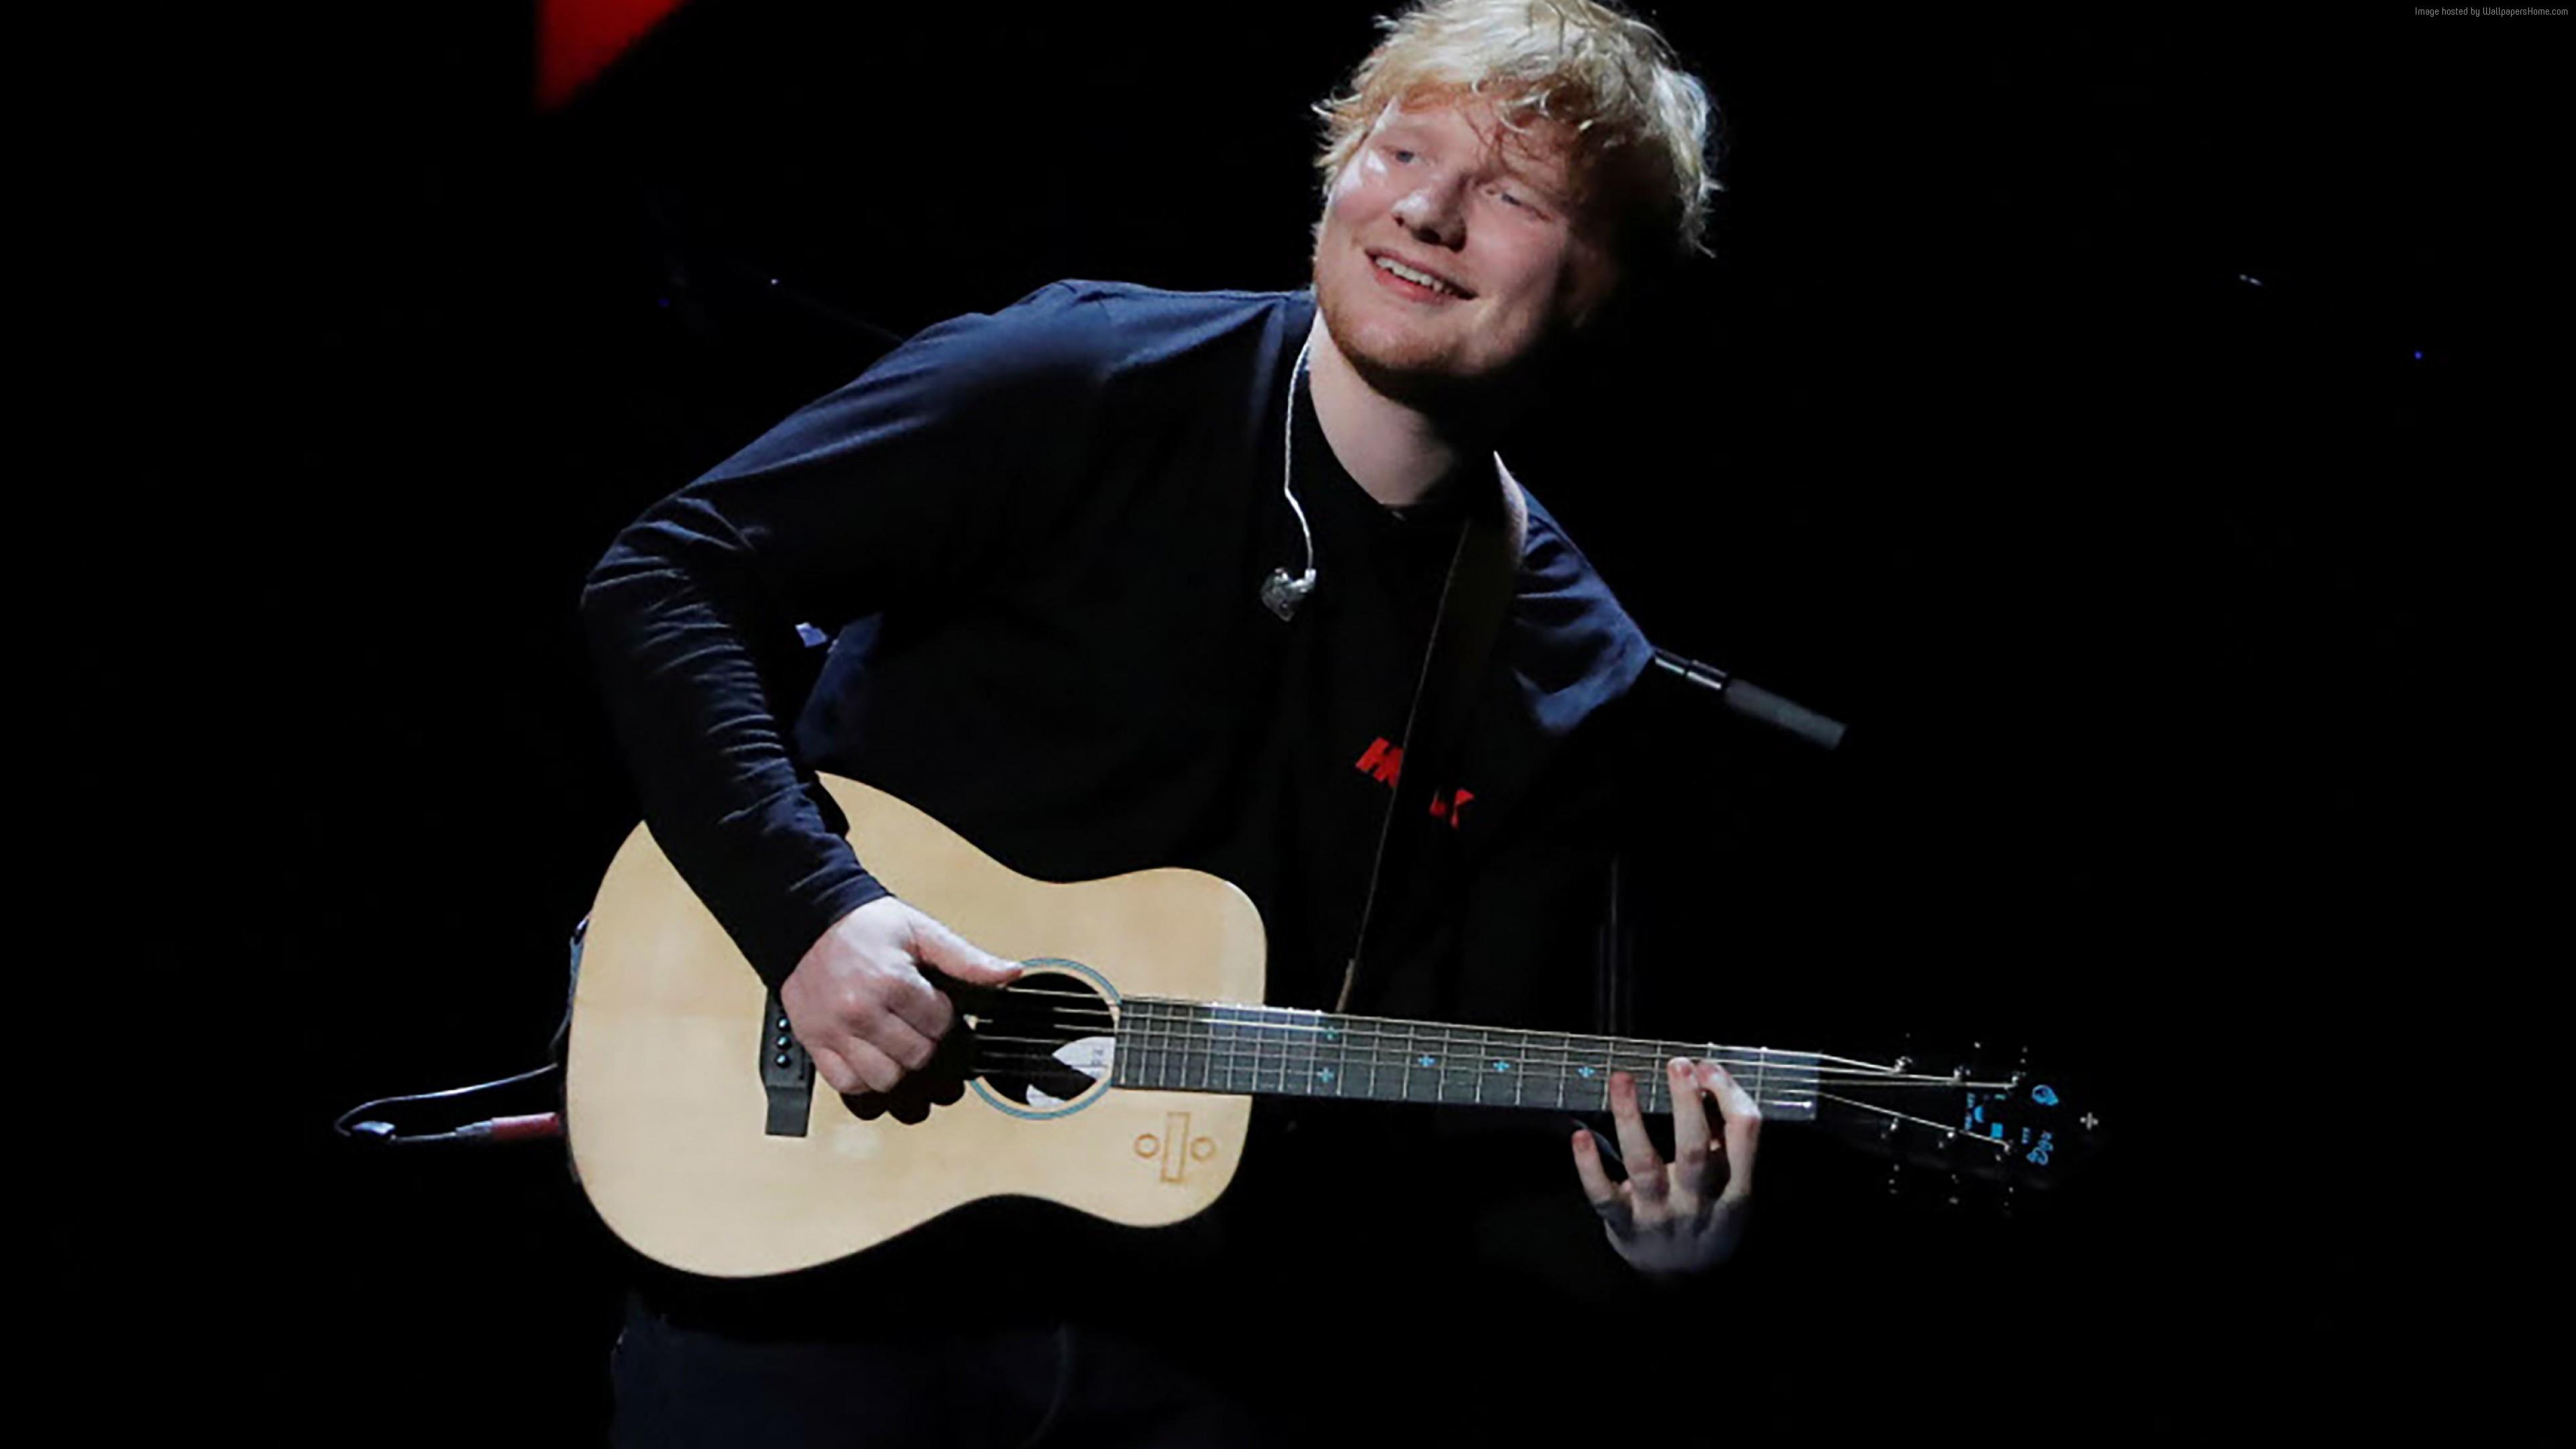 Wallpaper Ed Sheeran Photo Grammy 2018 4k Music Wallpaper Download High Resolution 4k Wallpaper